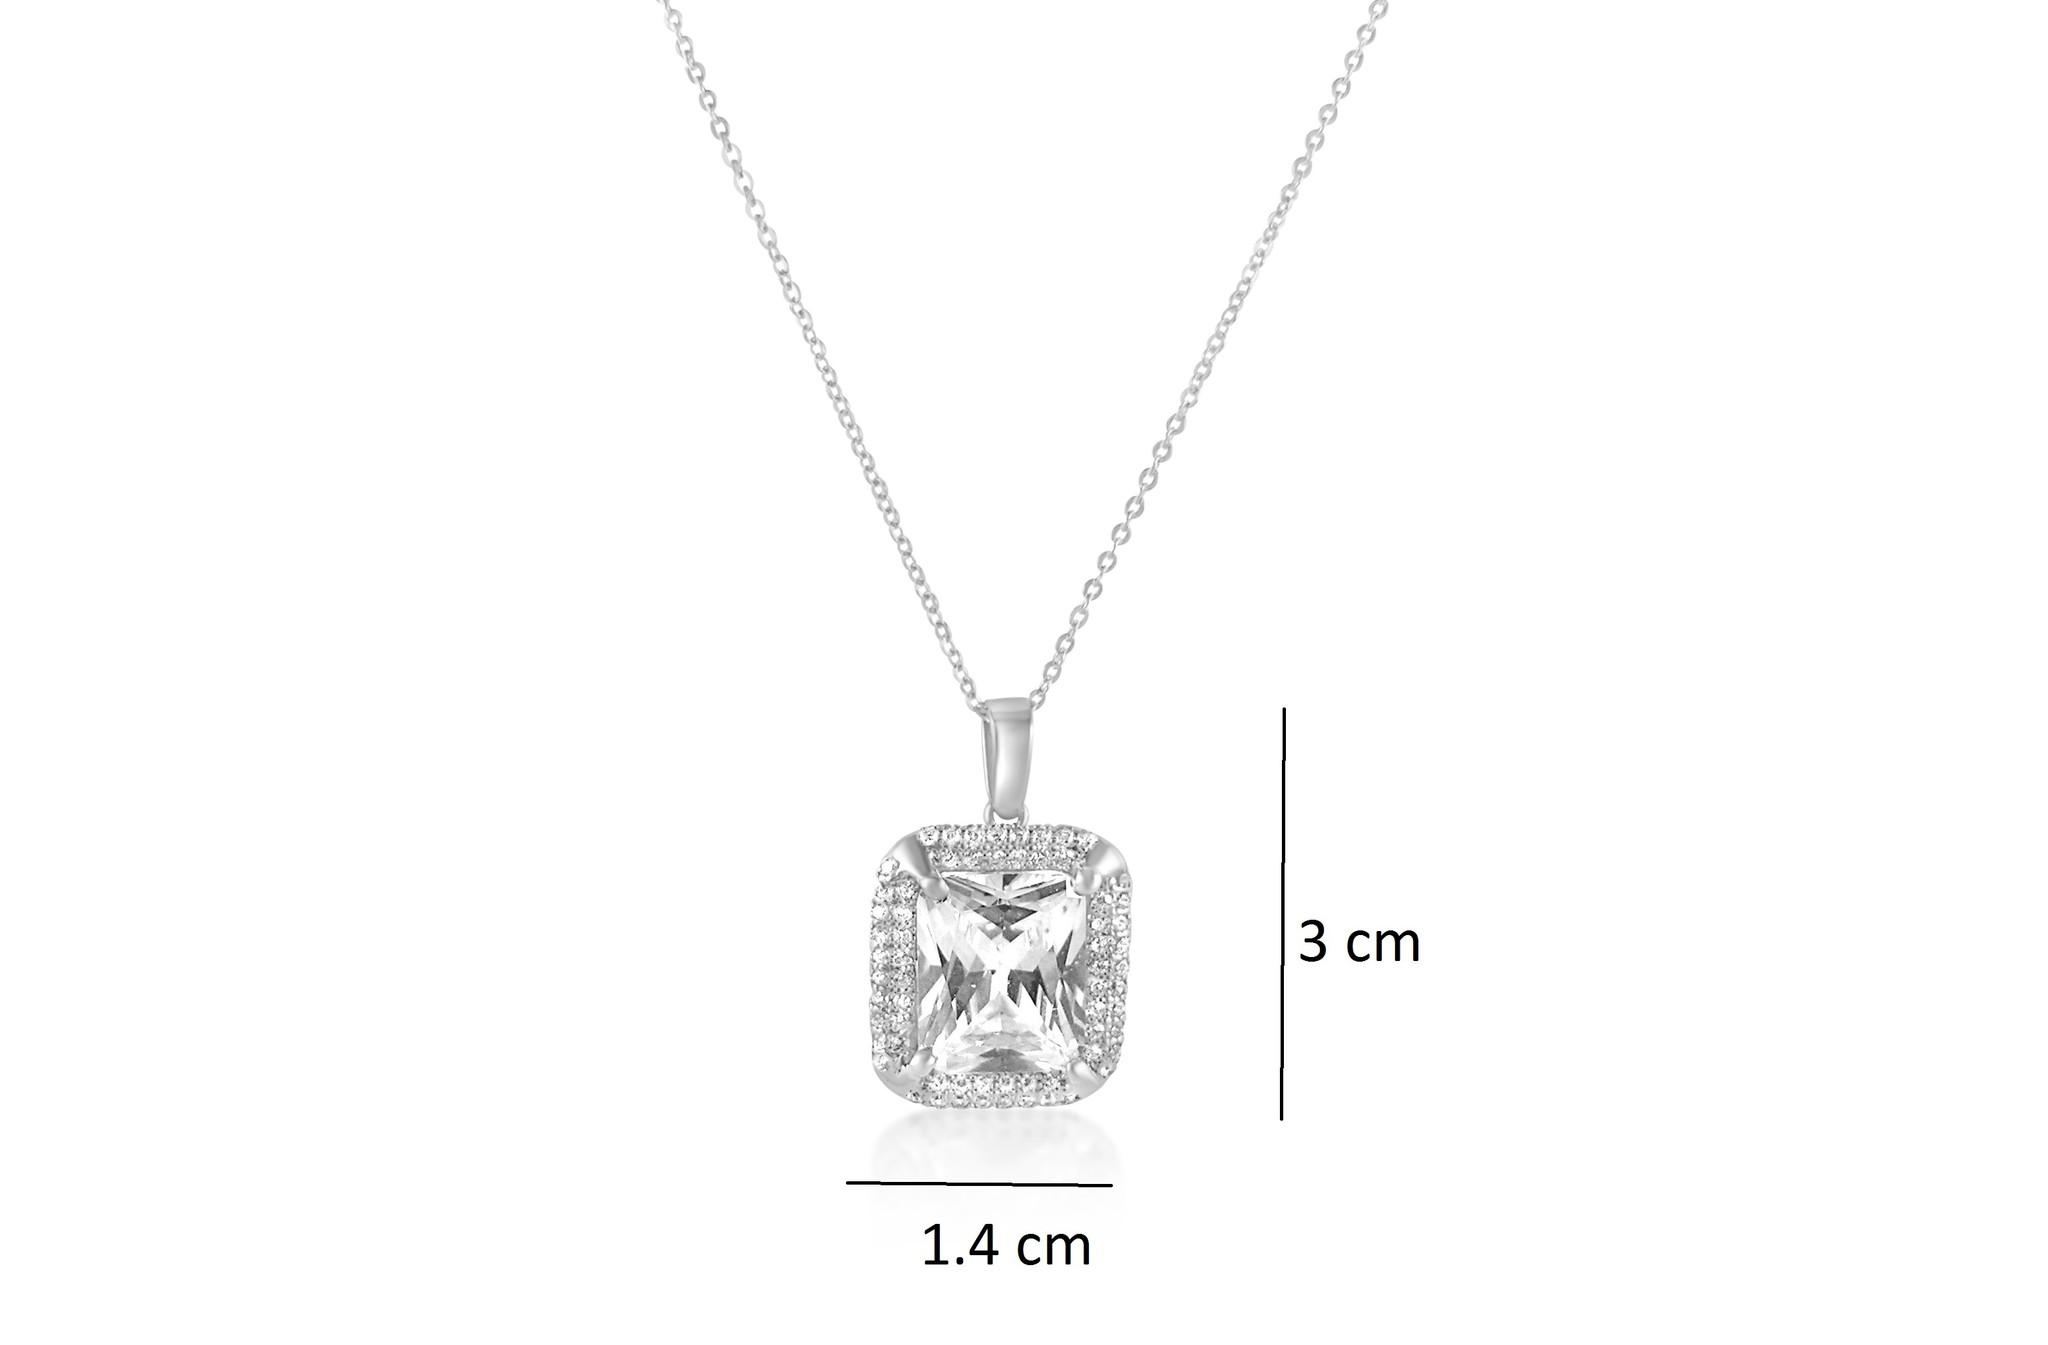 18 karat white gold pendant with zirconia